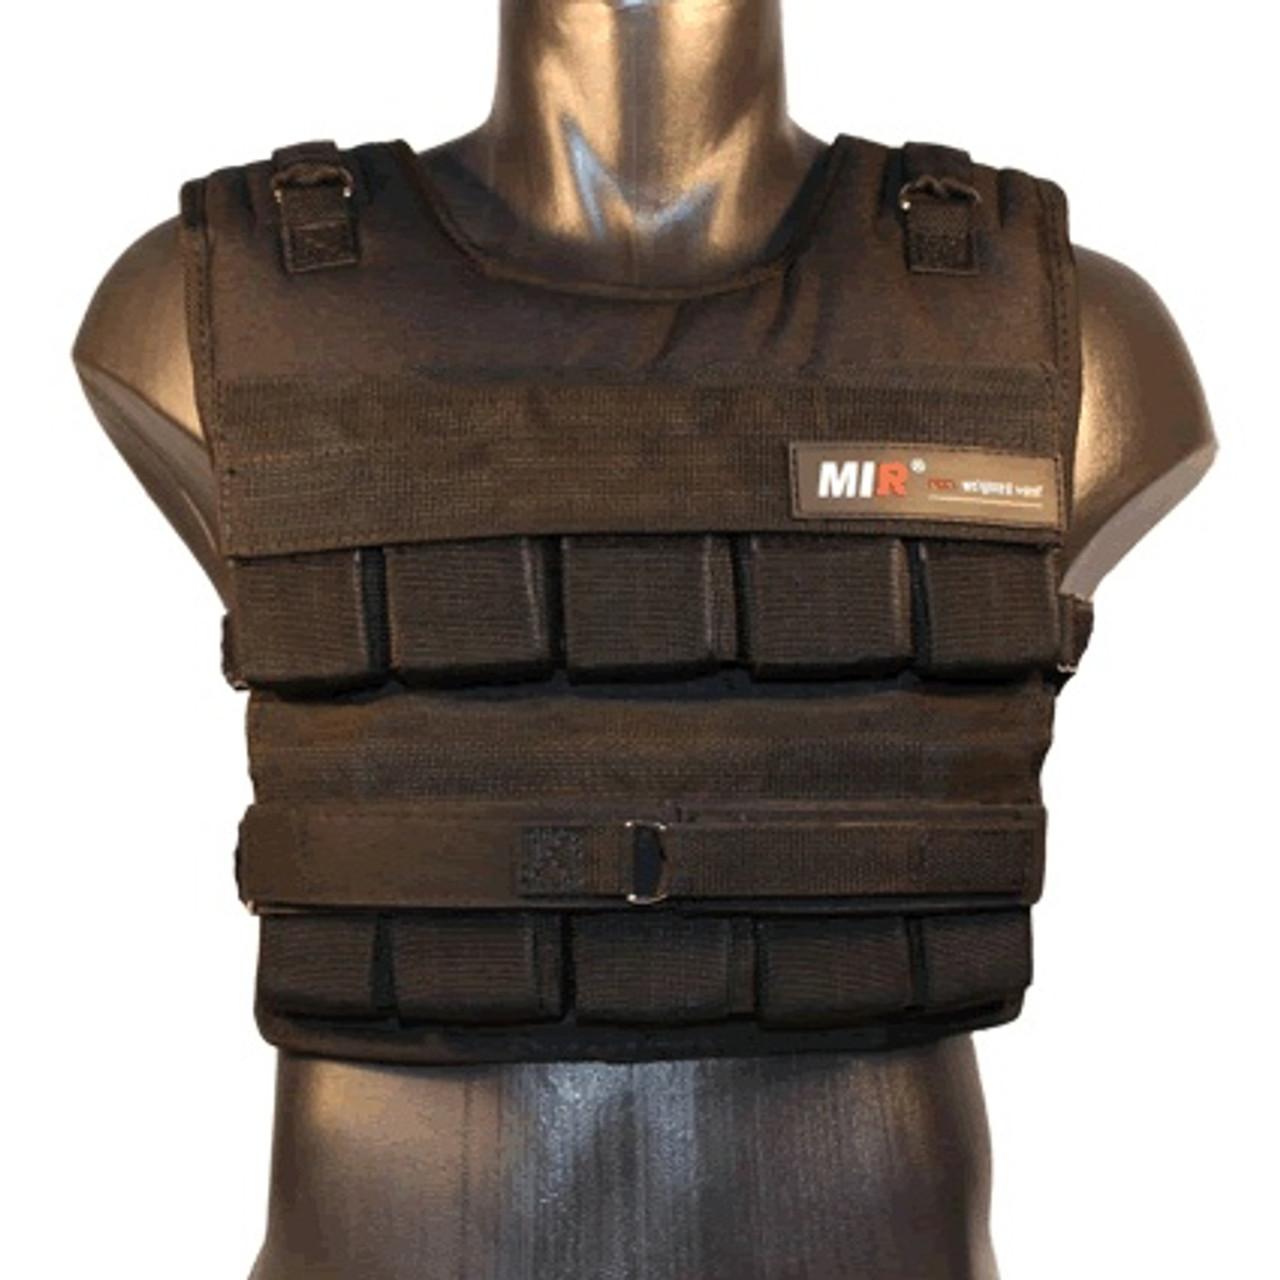 Standard, 50lbs Mir Short Weighted Vest Speed Release Option